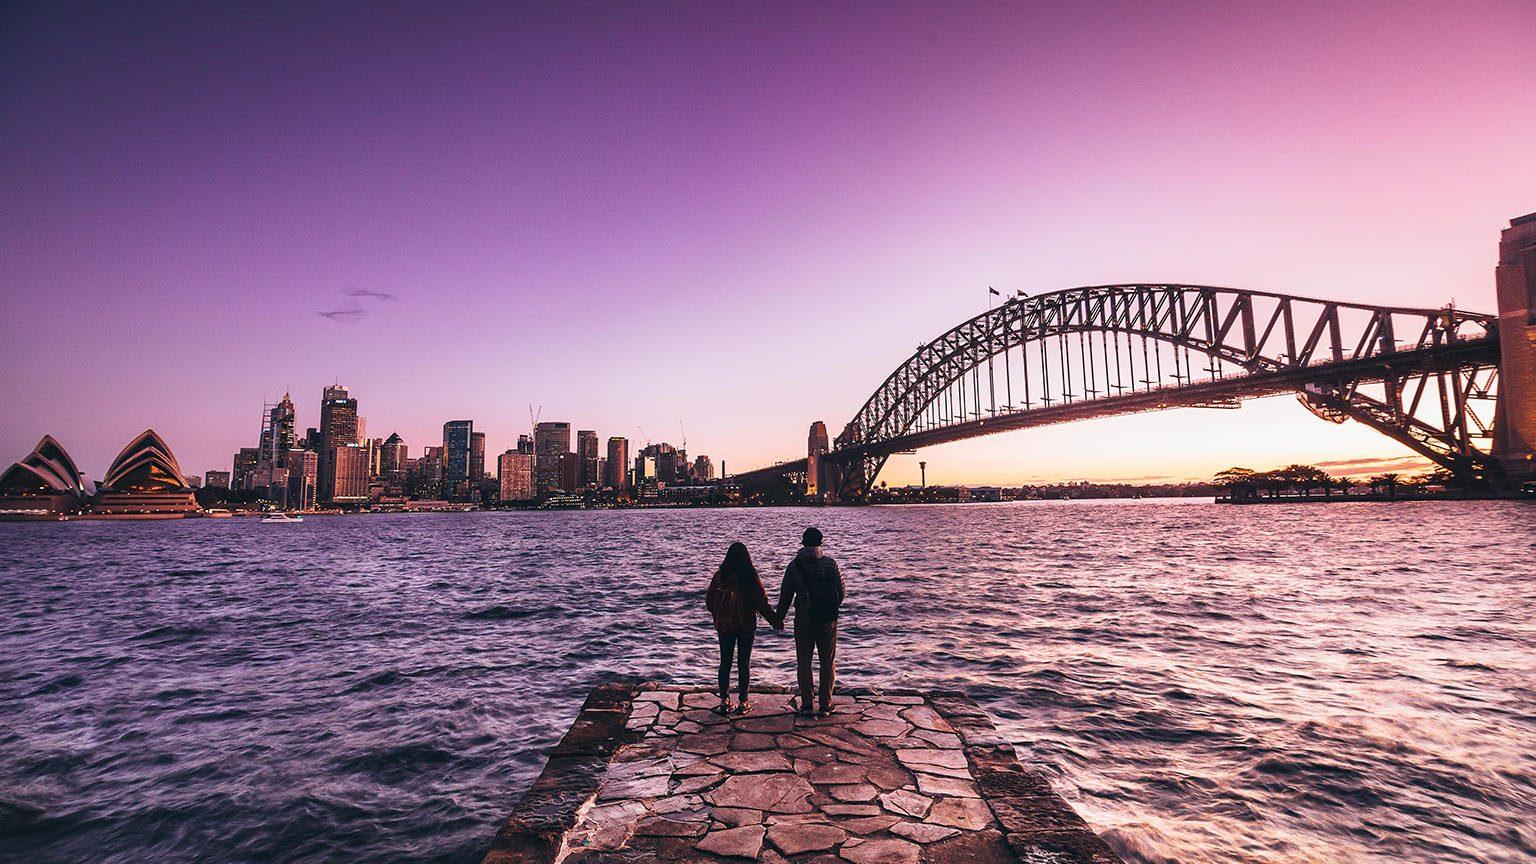 Photo Taken In Sydney, Australia